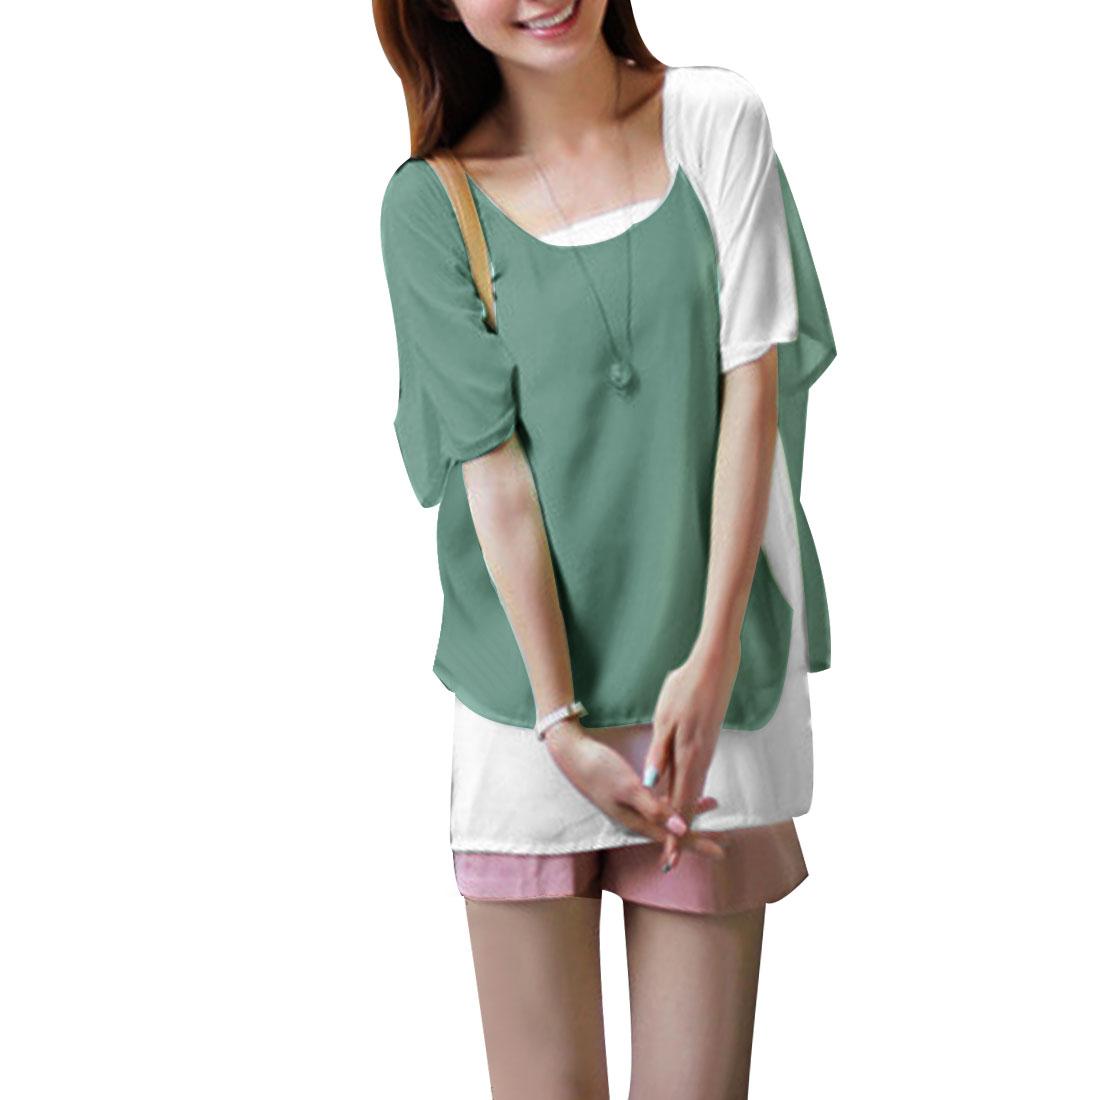 Ladies Light Green Irregular Hem Two Layer Chiffon Panel Blouse XS